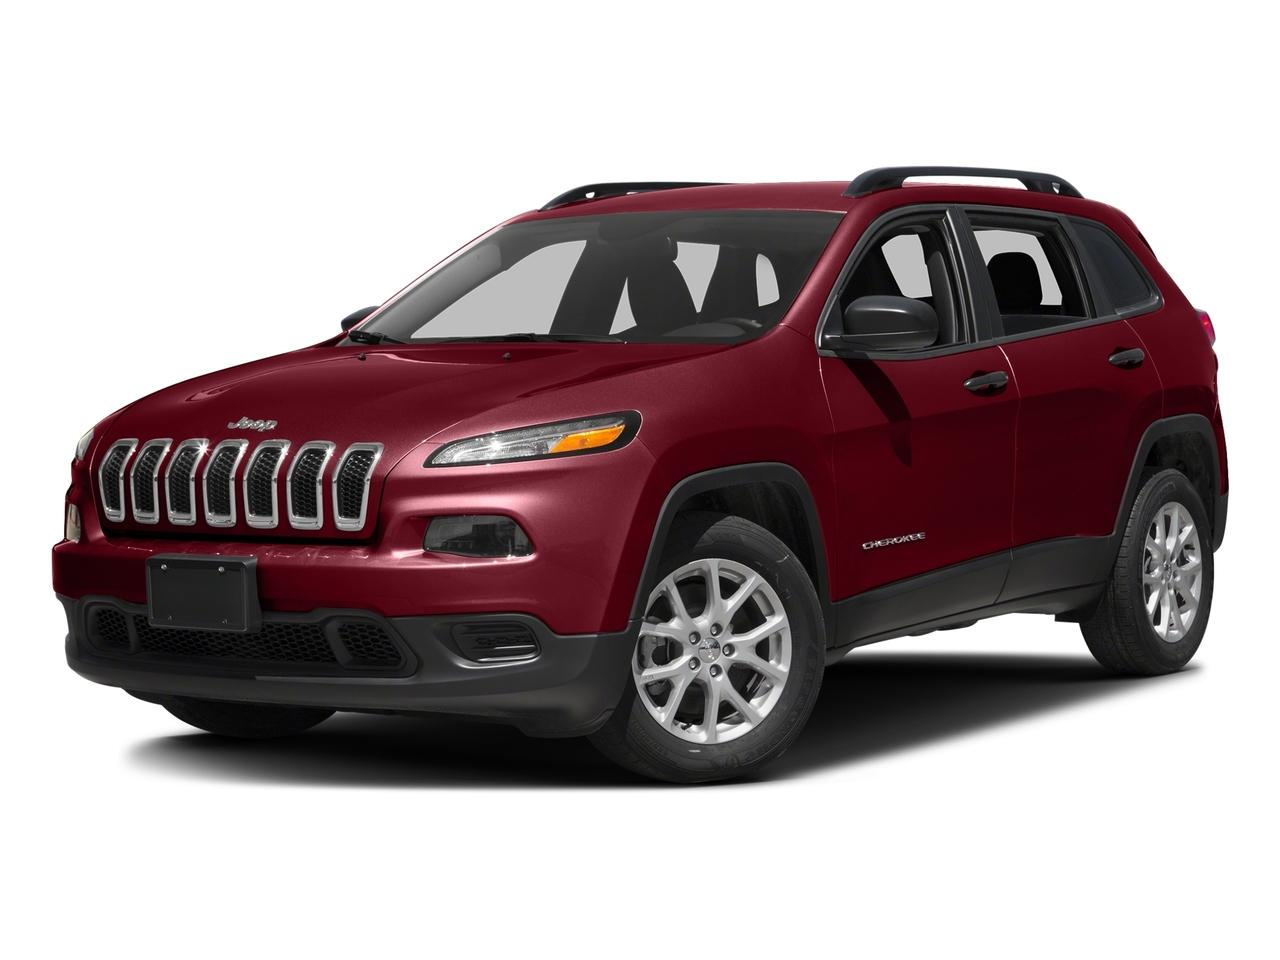 2016 Jeep Cherokee Vehicle Photo in Colma, CA 94014